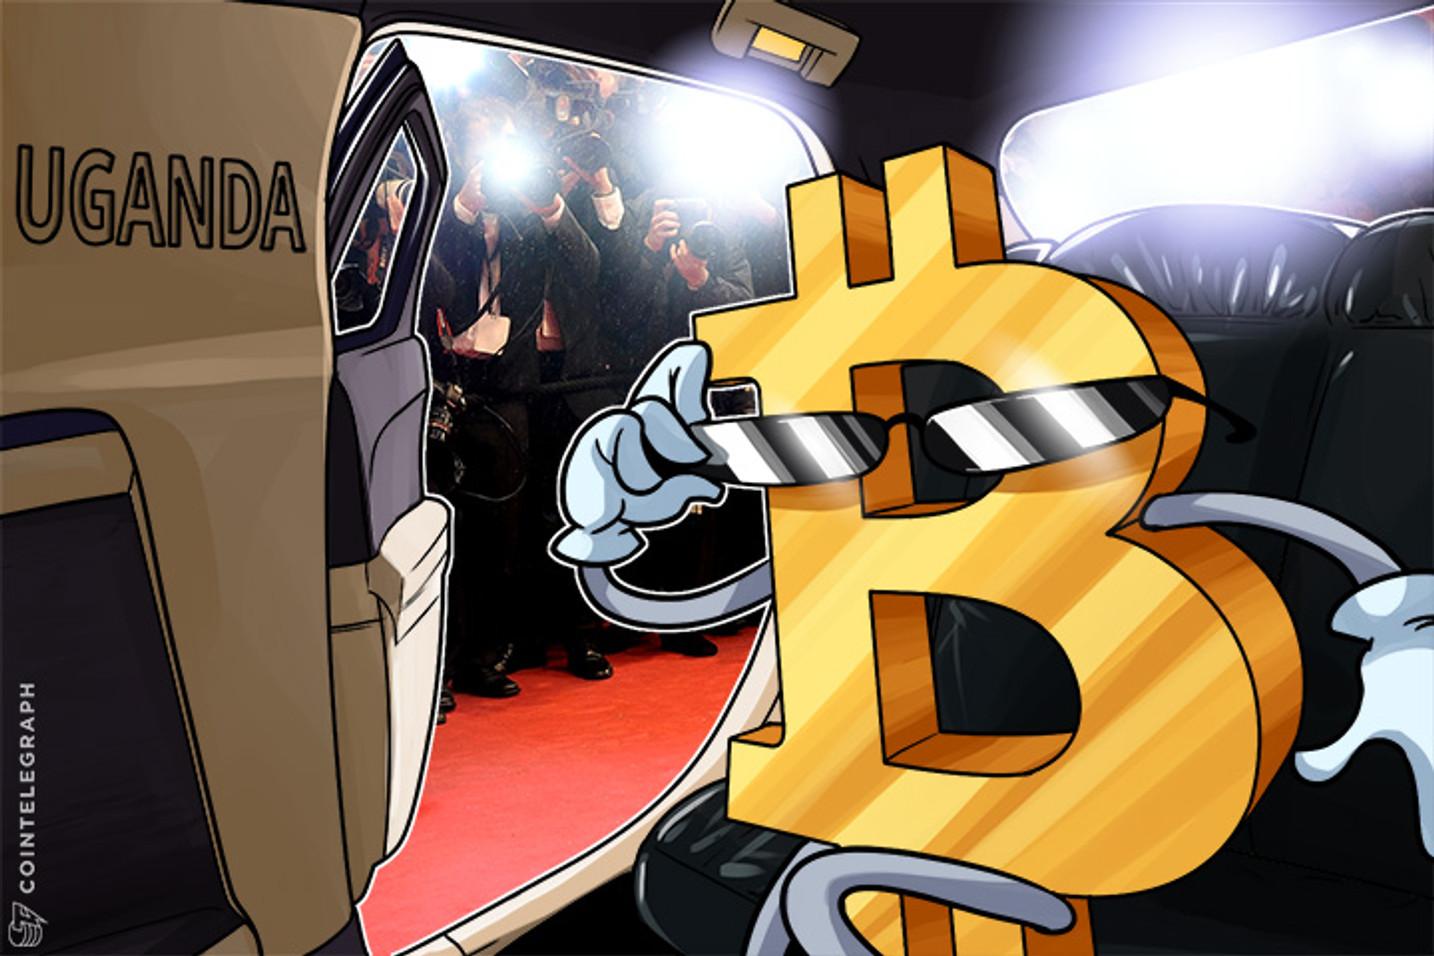 Uganda Bitcoin Queen: Bank of Uganda Warning Only Makes Bitcoin Popular